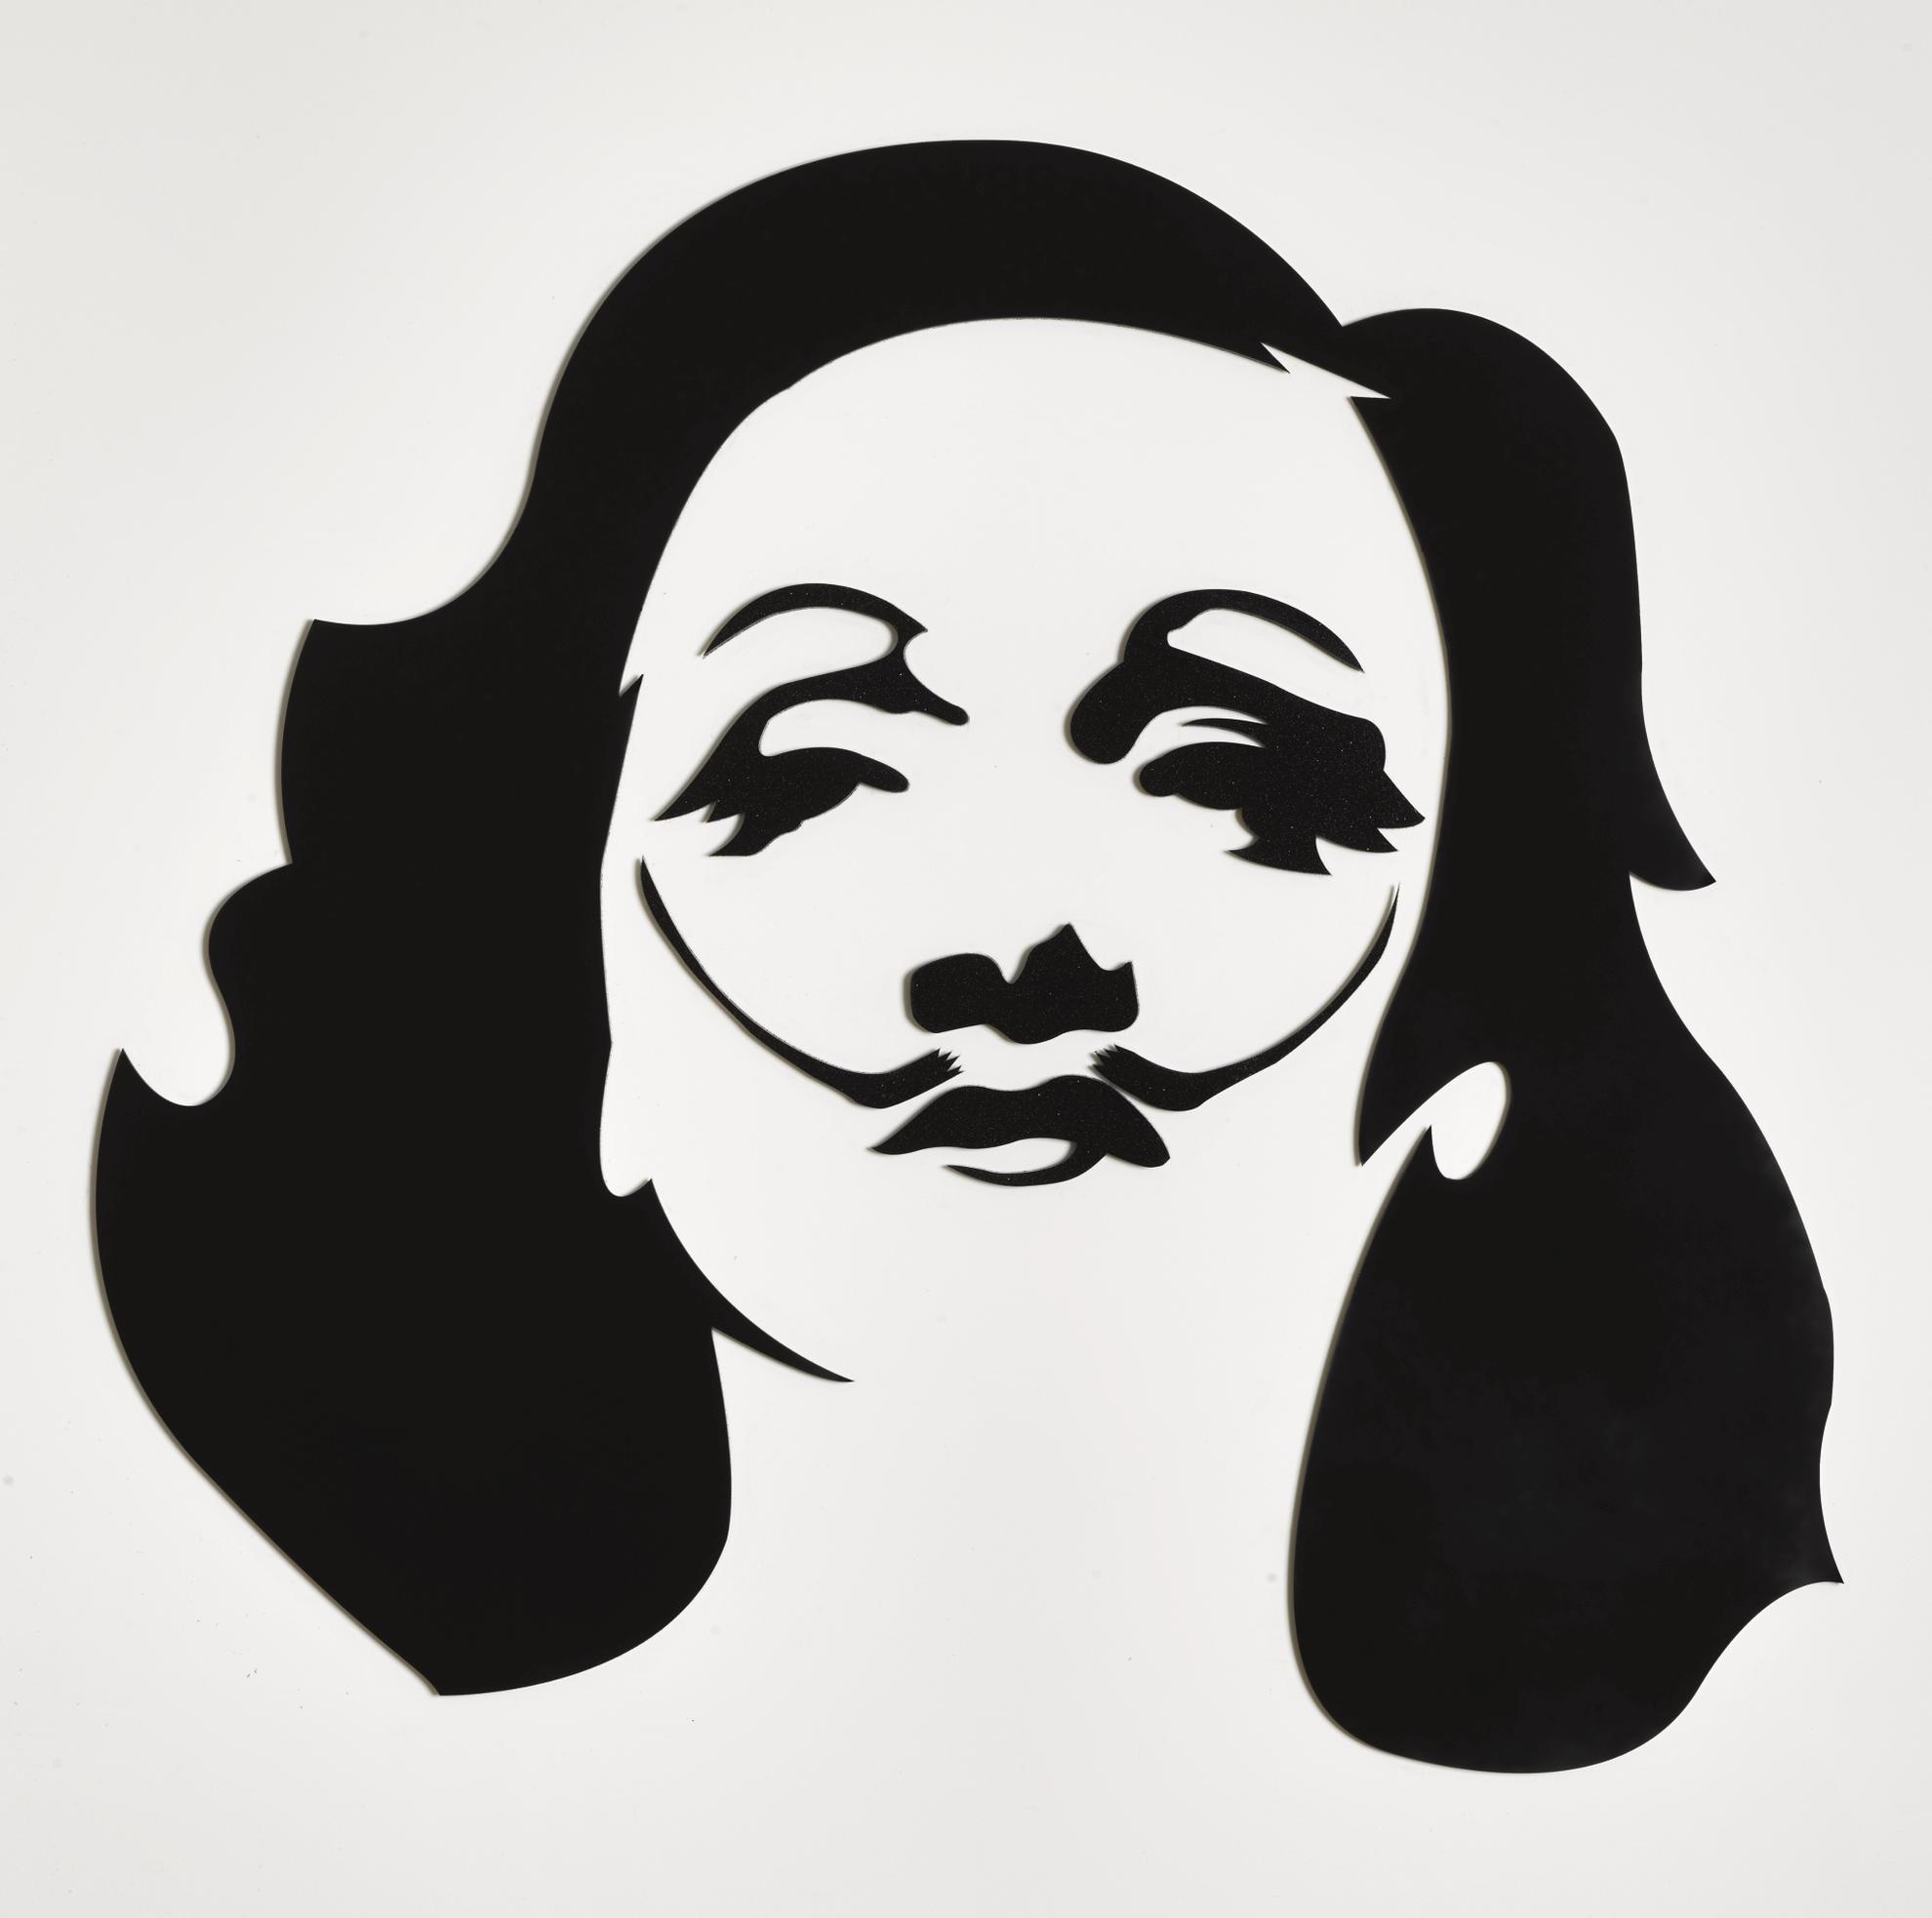 Pure Evil-Marlene Dali-2017